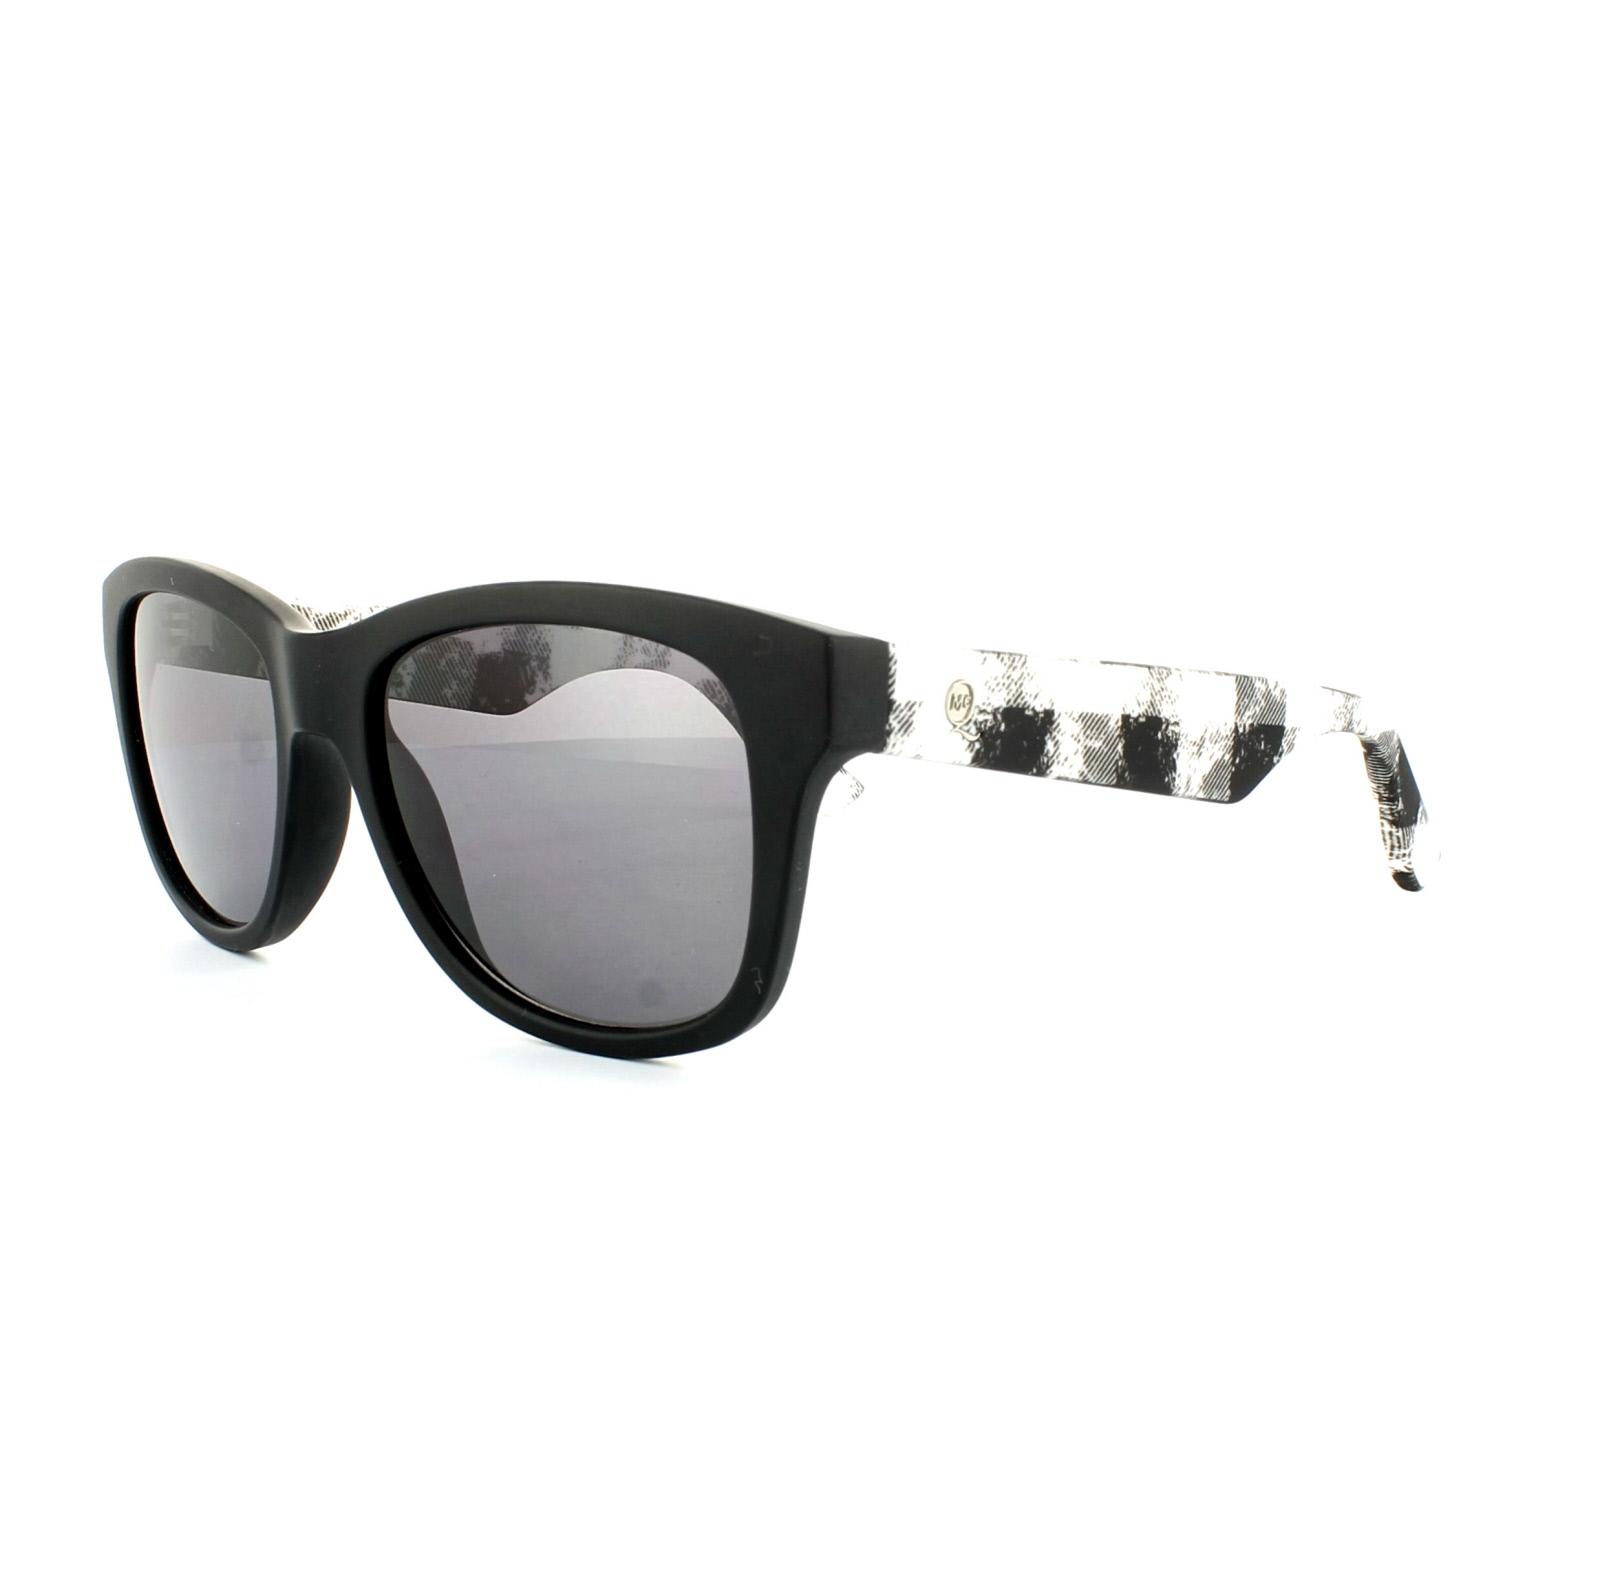 Sentinel McQ Alexander McQueen Sunglasses 0002 S RIE Y1 Matt Black White  Marble Grey 9715f02d01